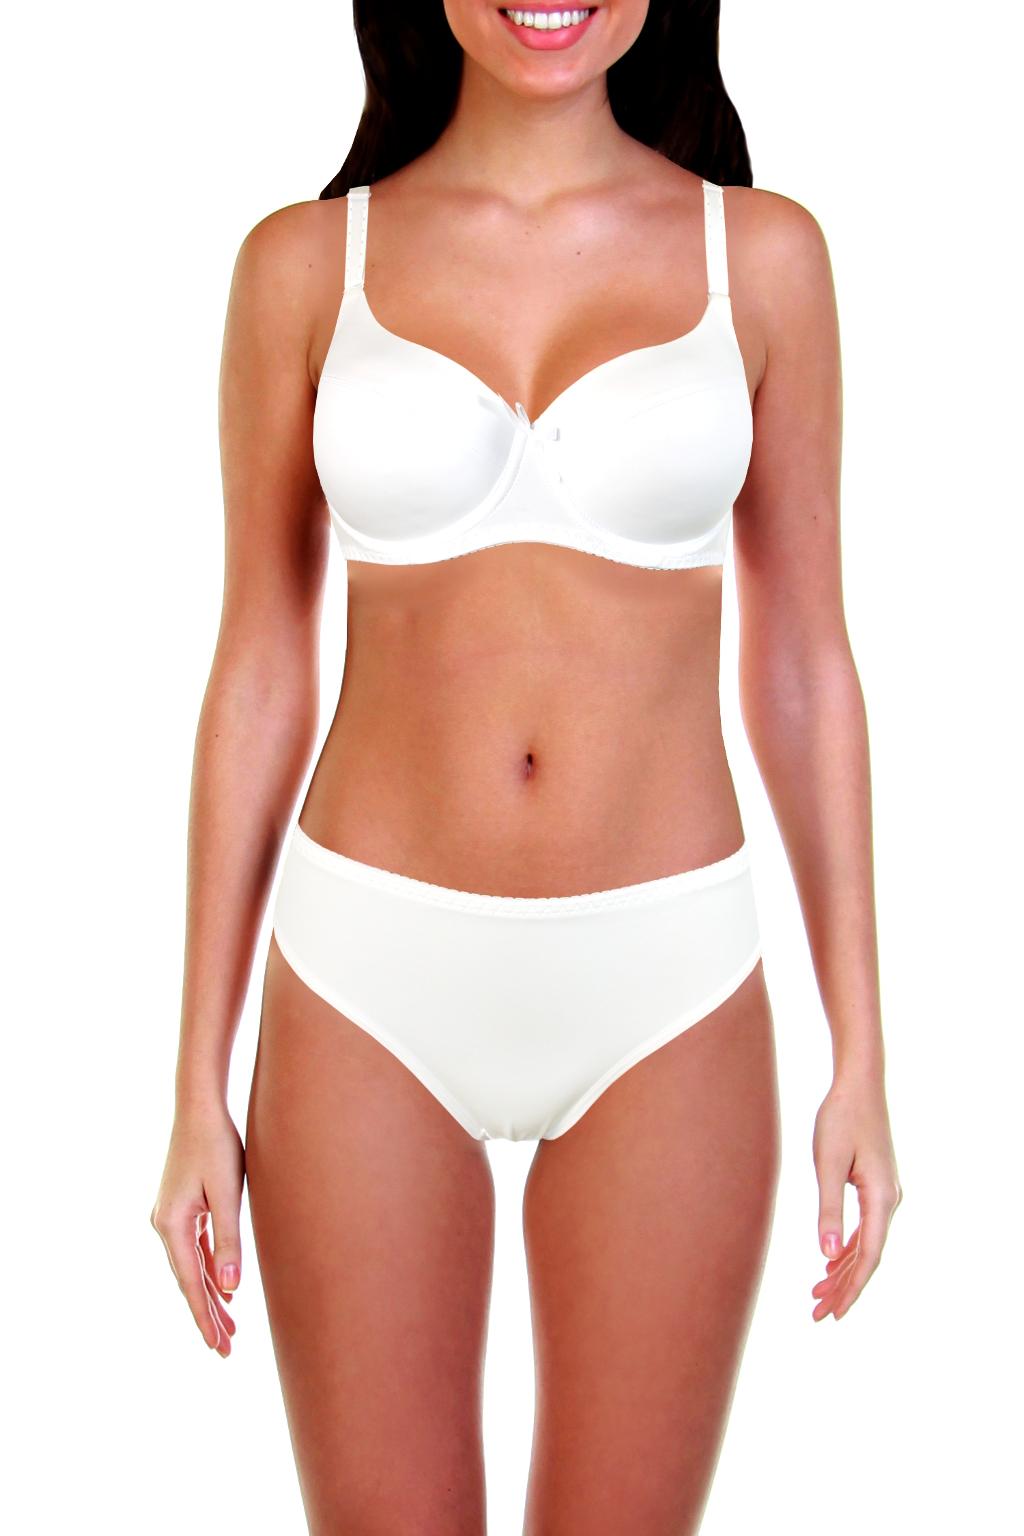 Bibiona komplet podprsenka a kalhotky 80D bílá